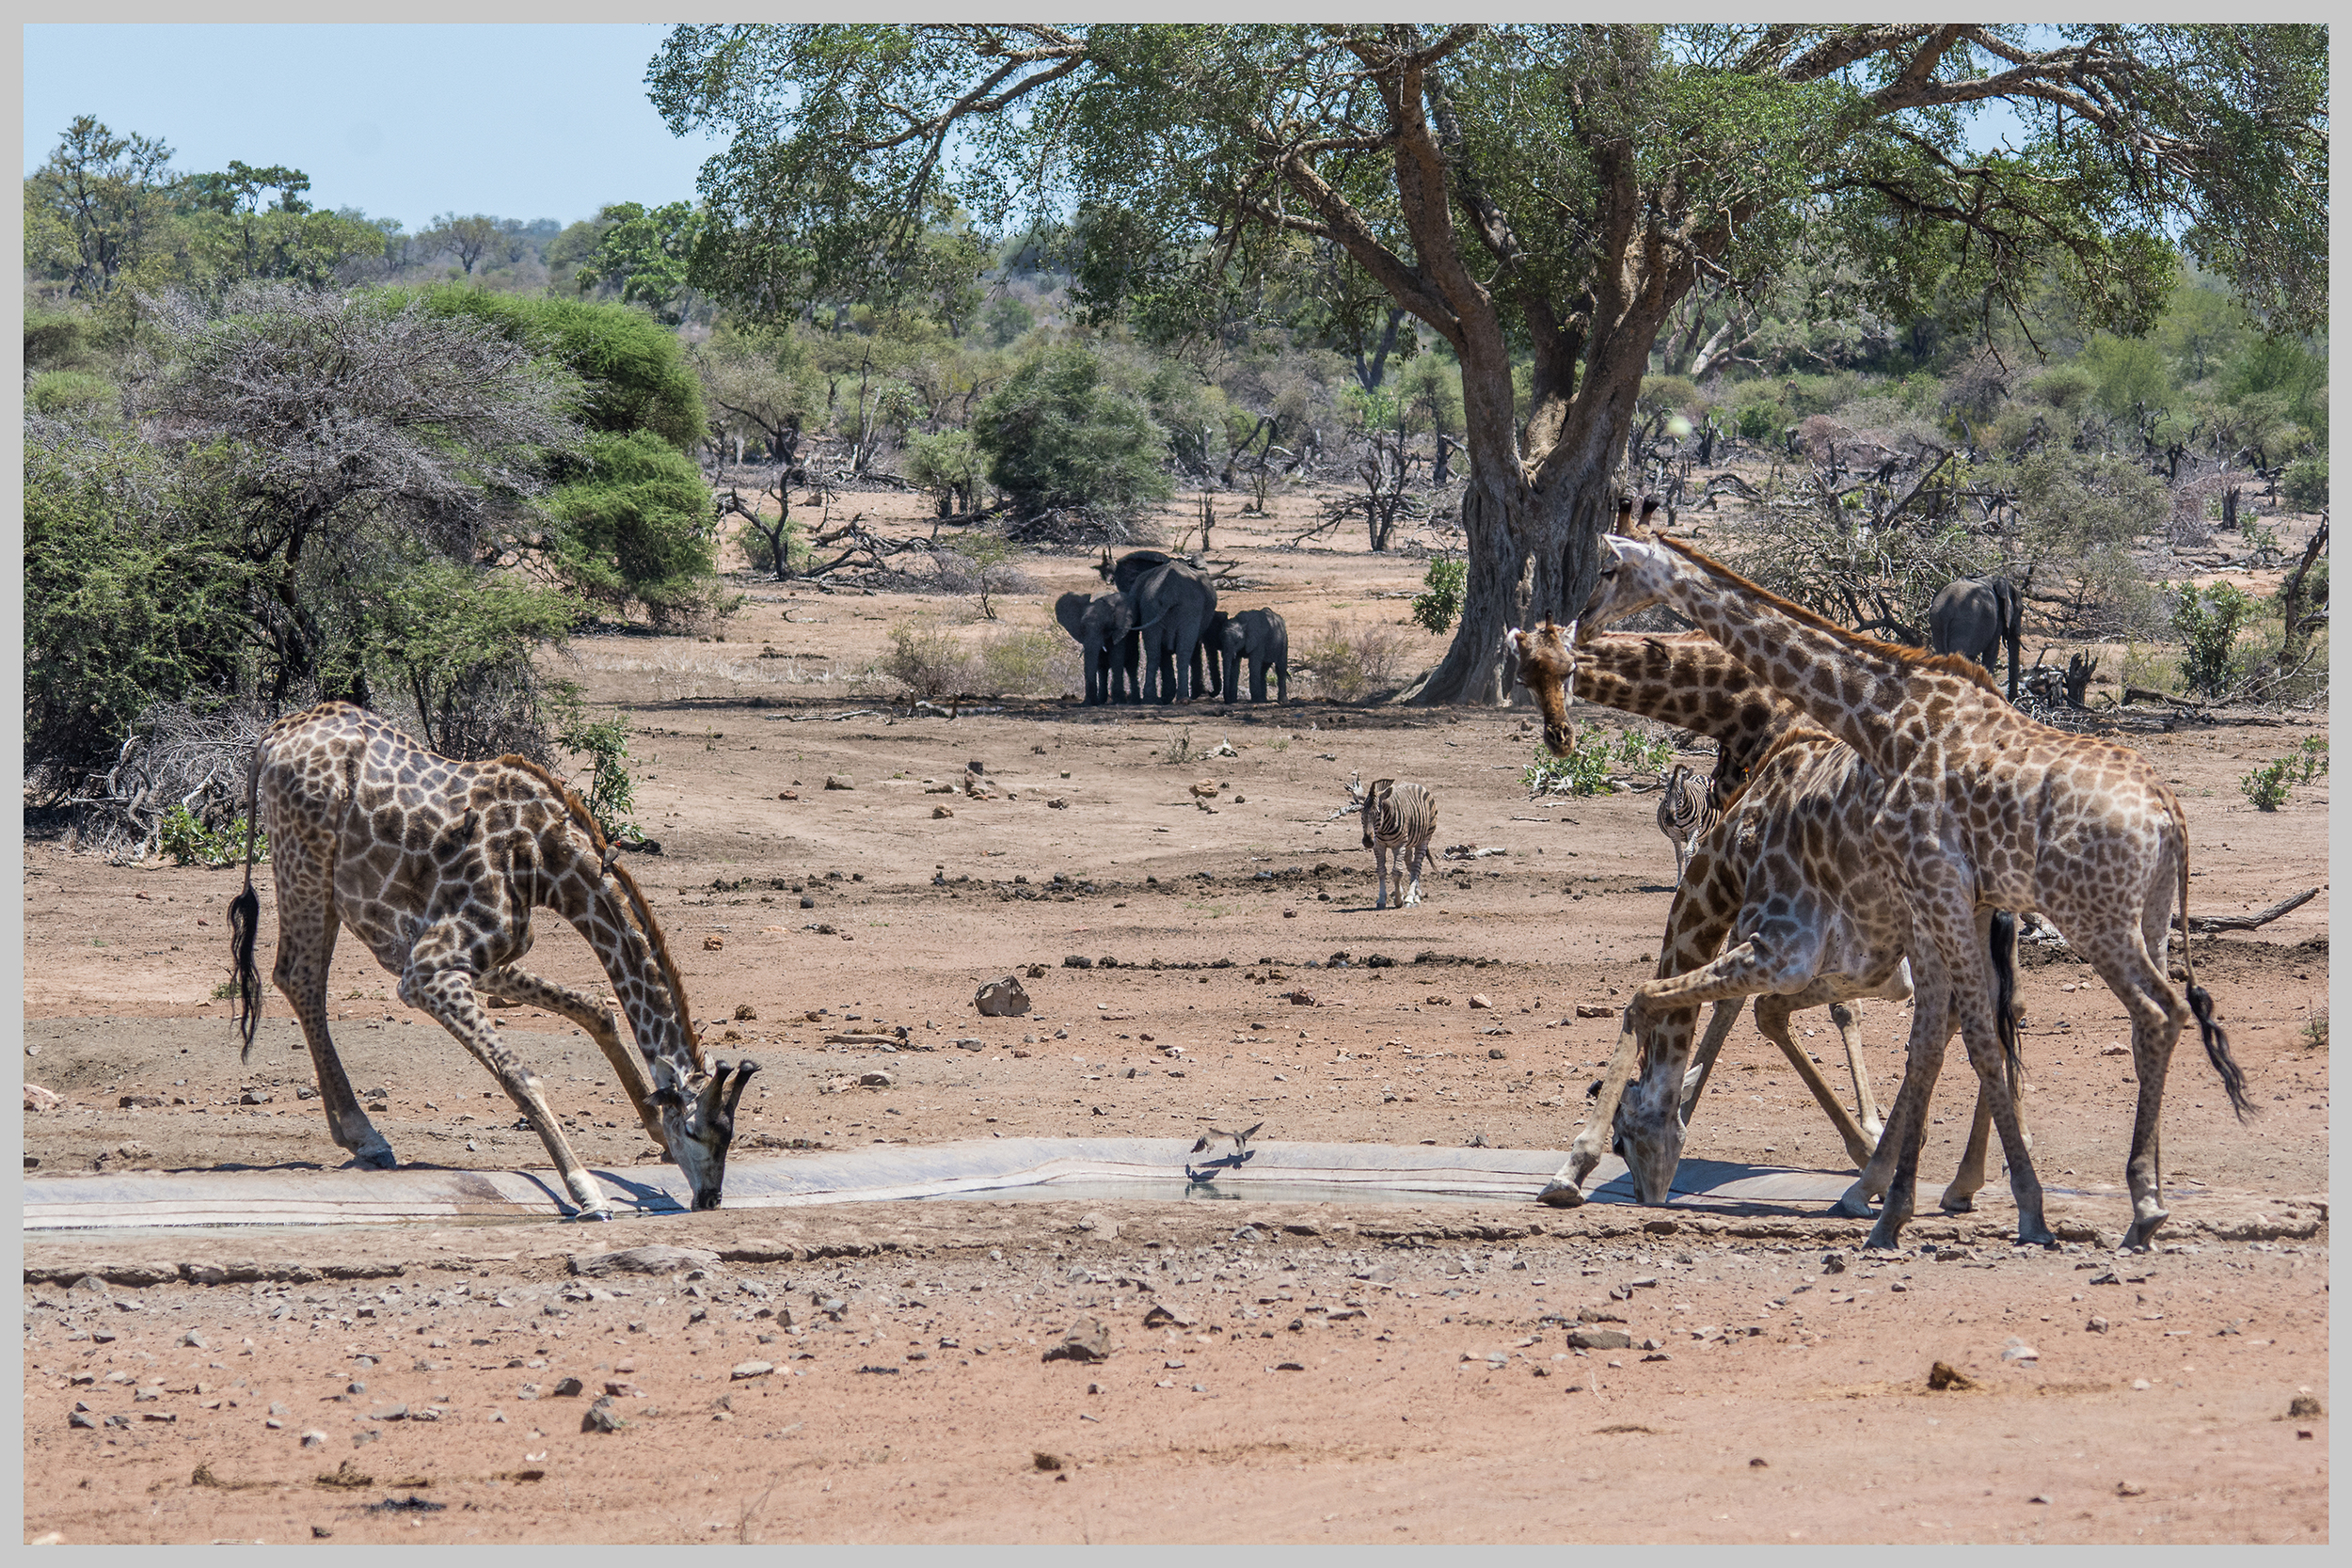 Giraffe, Zebra and African Elephant